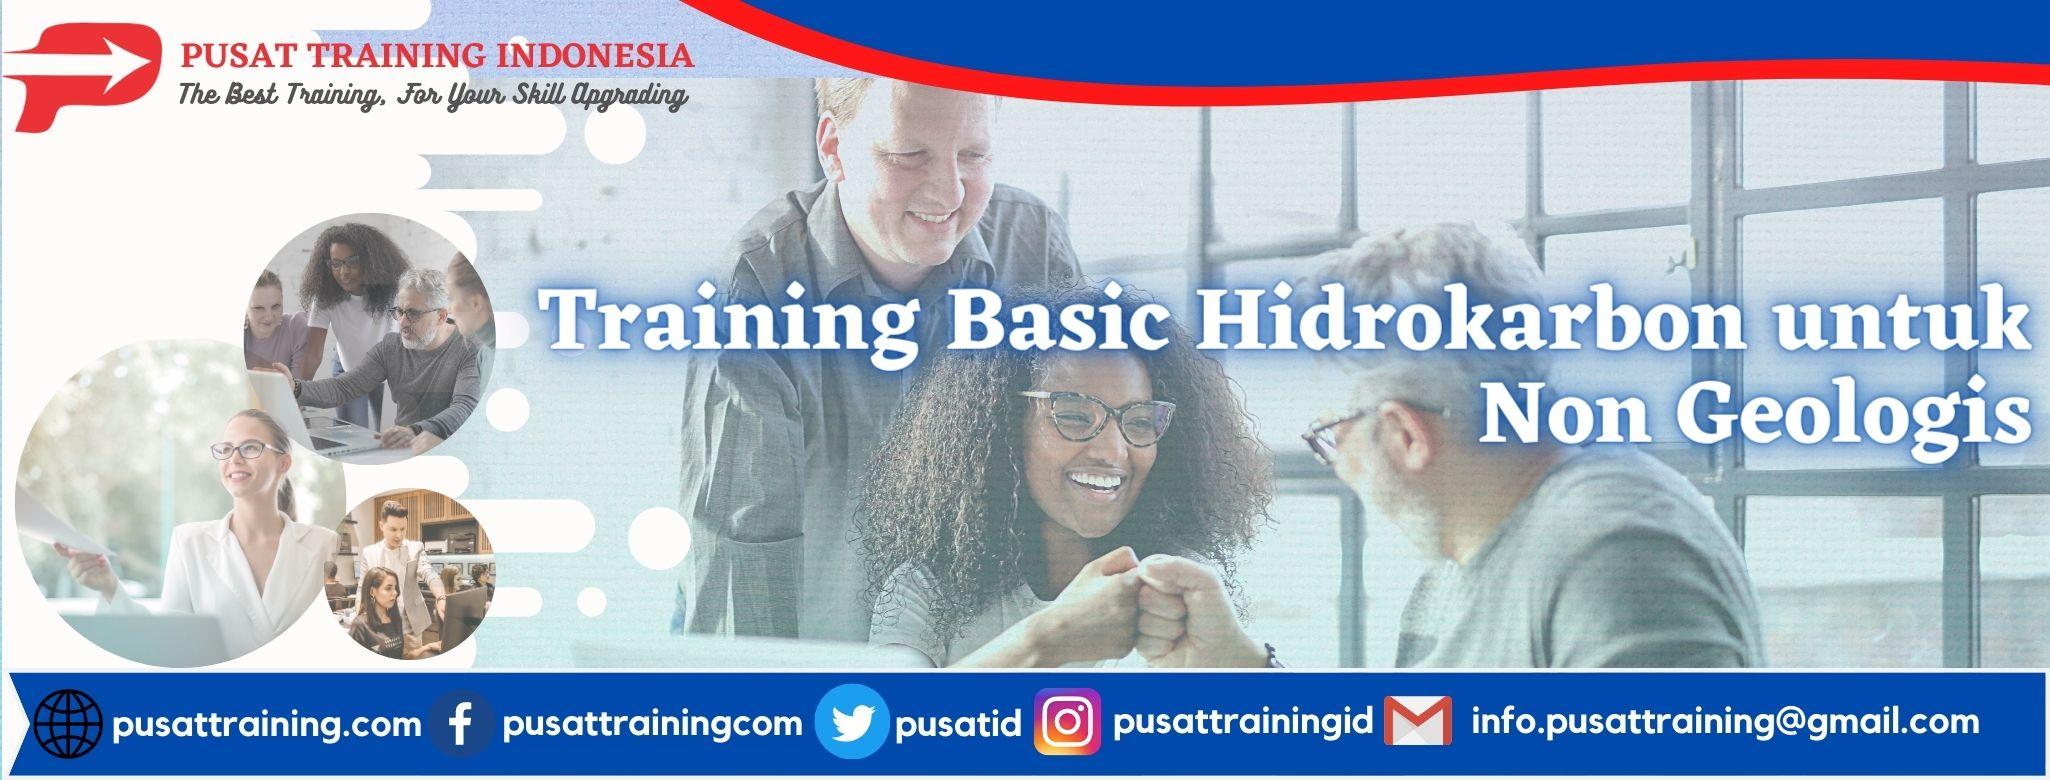 Training-Basic-Hidrokarbon-untuk-Non-Geologis